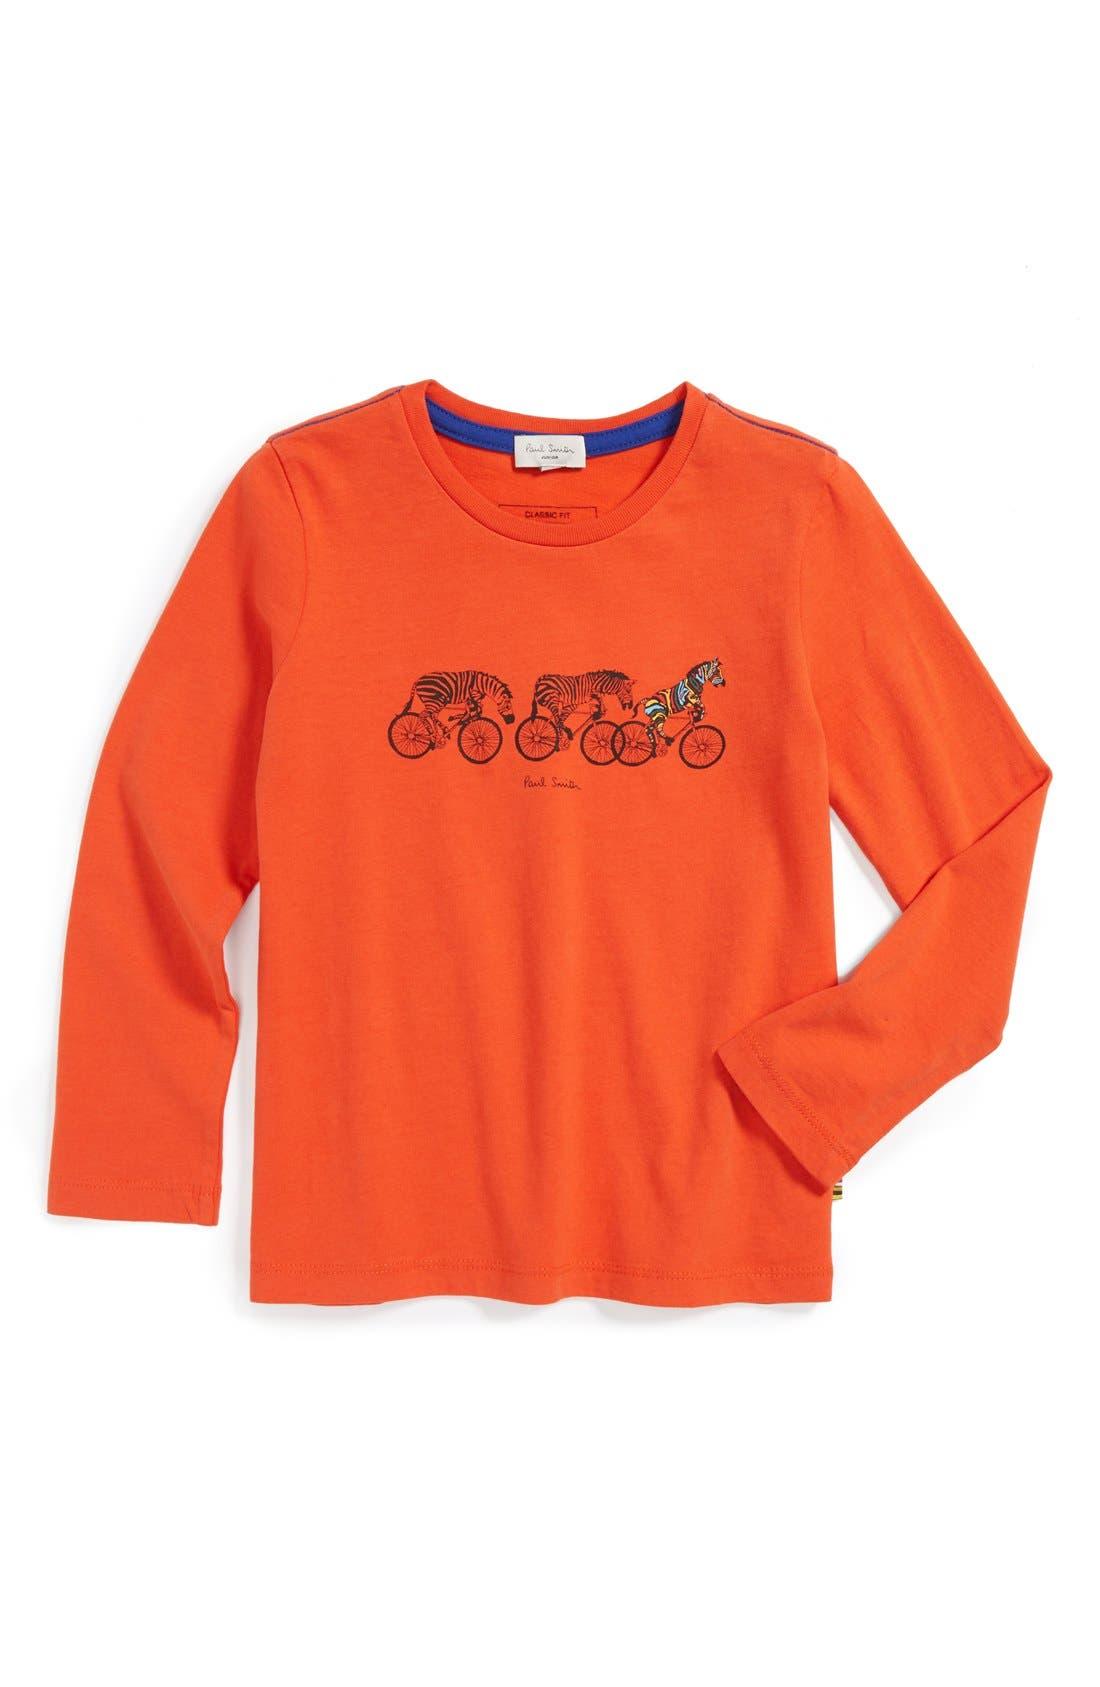 Main Image - Paul Smith Junior 'Zebras on Bikes' Long Sleeve T-Shirt (Toddler Boys, Little Boys & Big Boys)